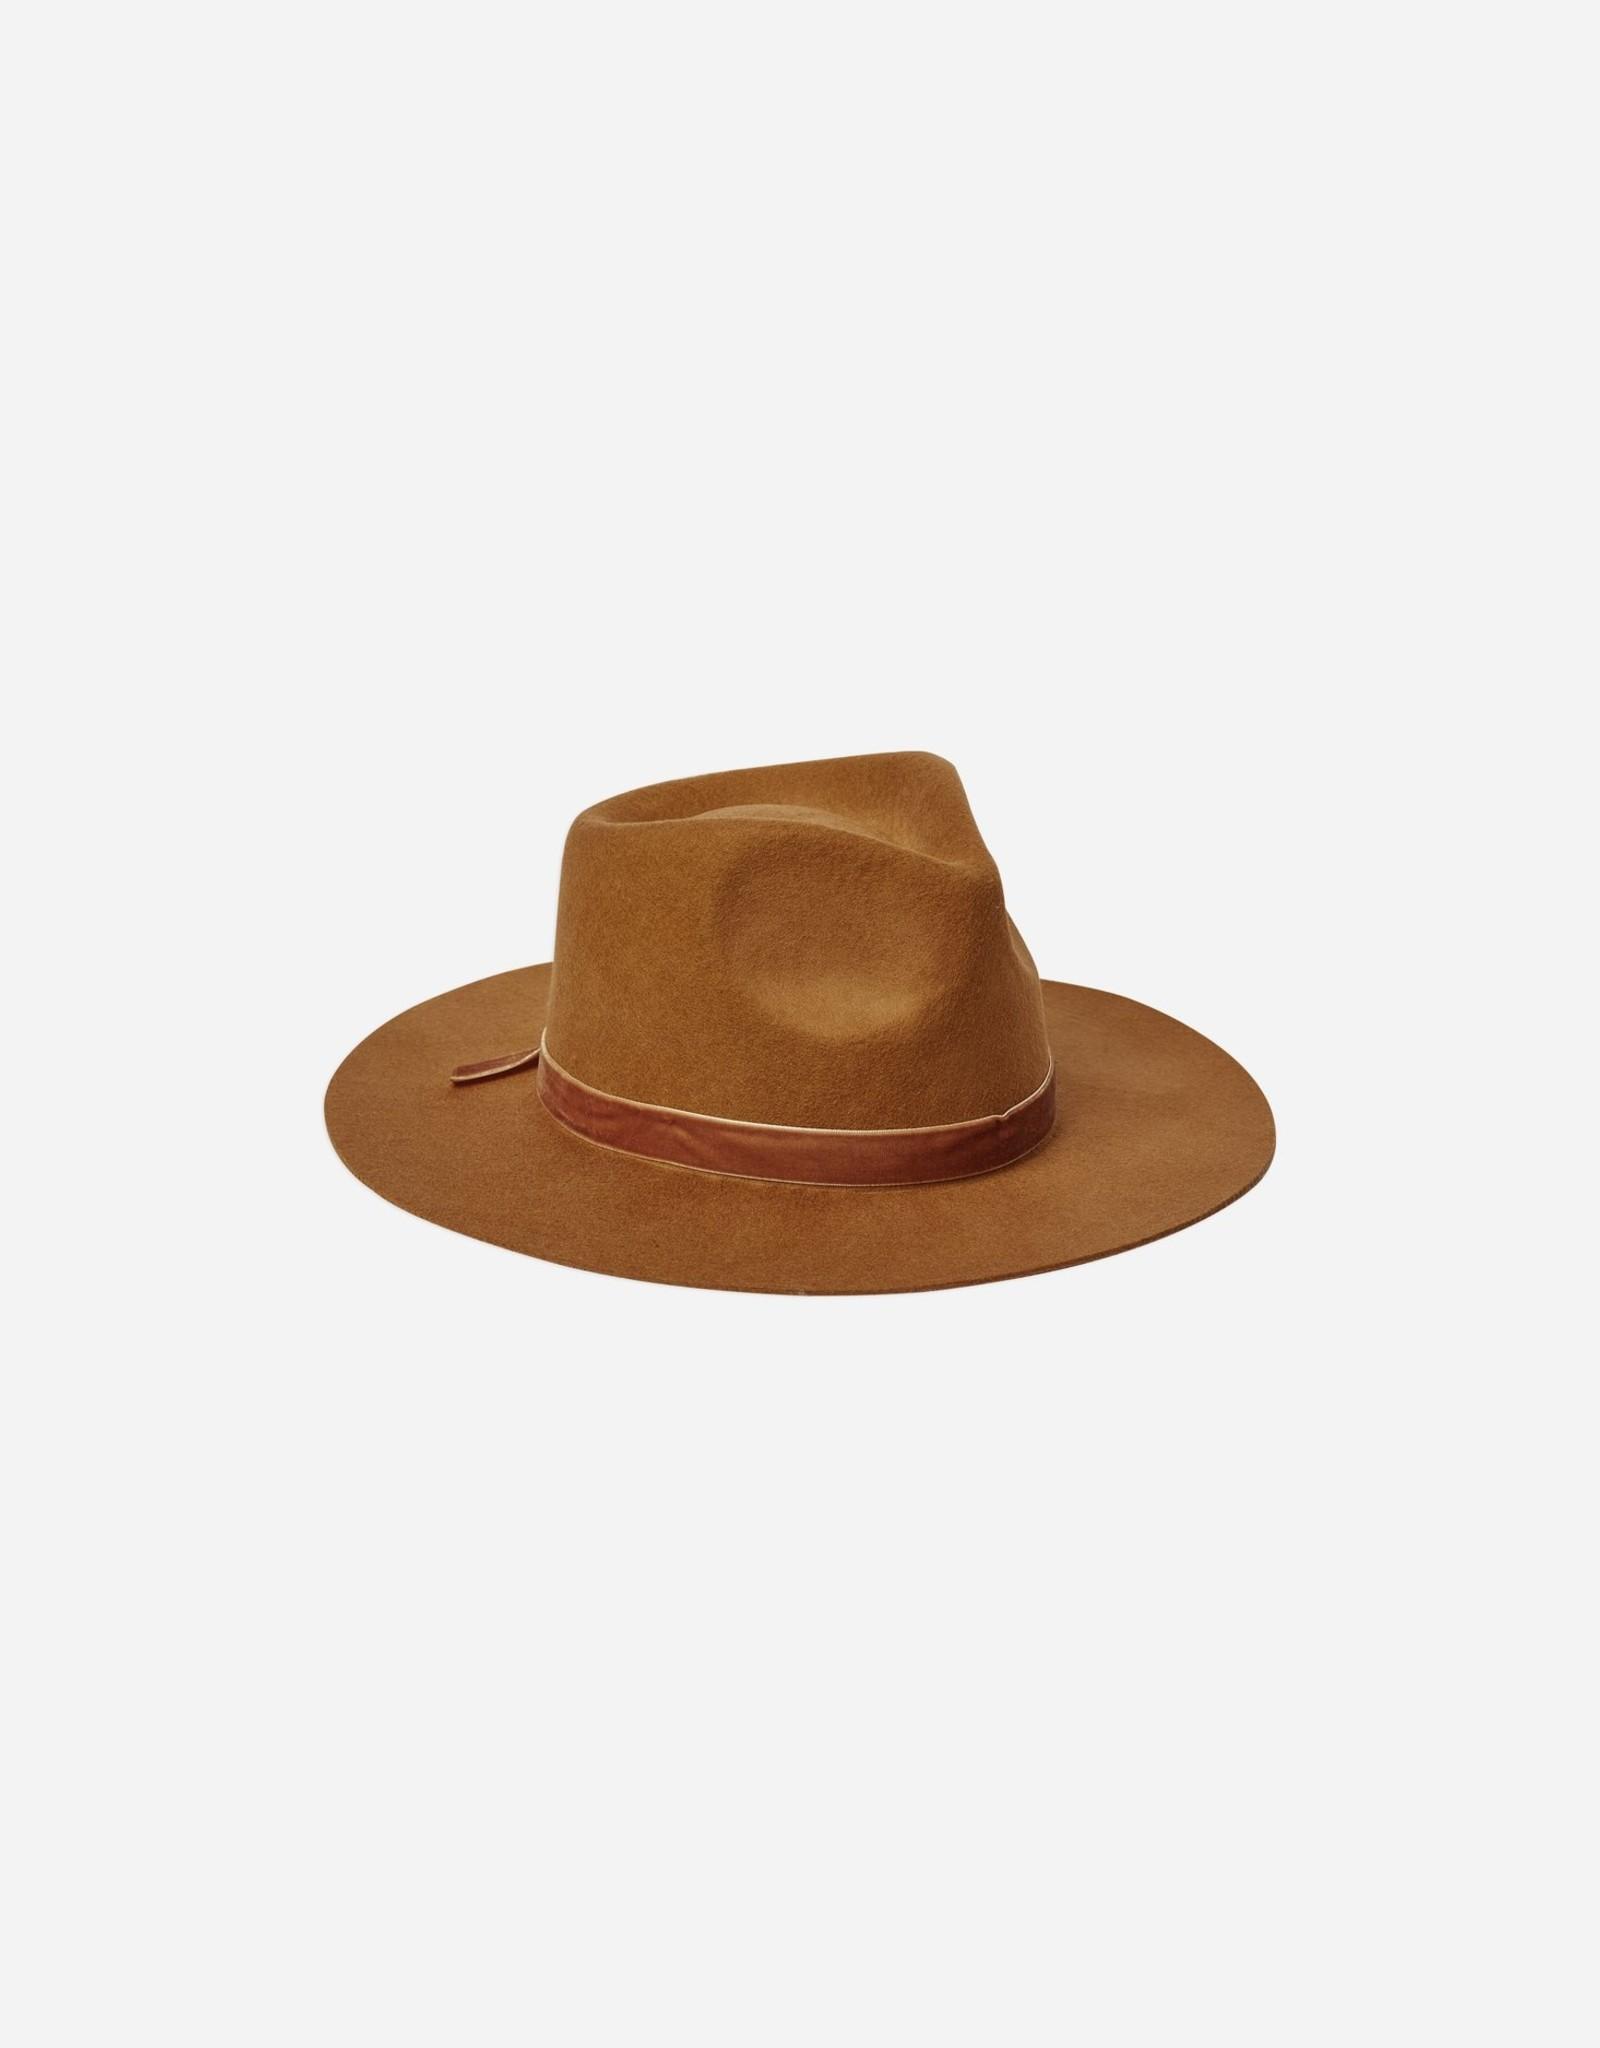 Rylee & Cru Rylee & Cru Rancher Hat 53cm